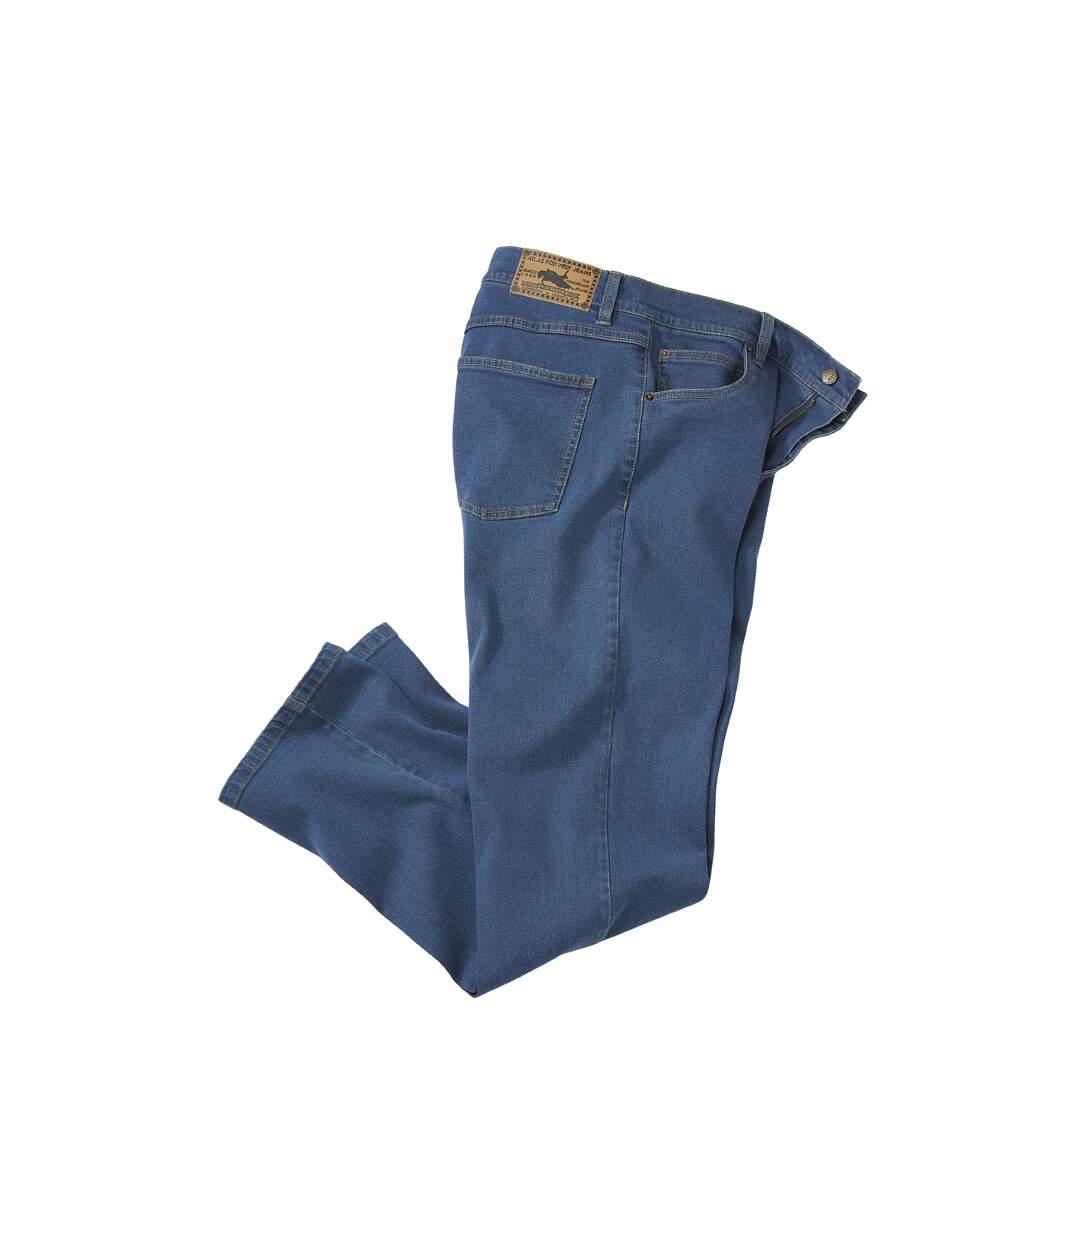 Dunkelblaue Stretch-Jeans